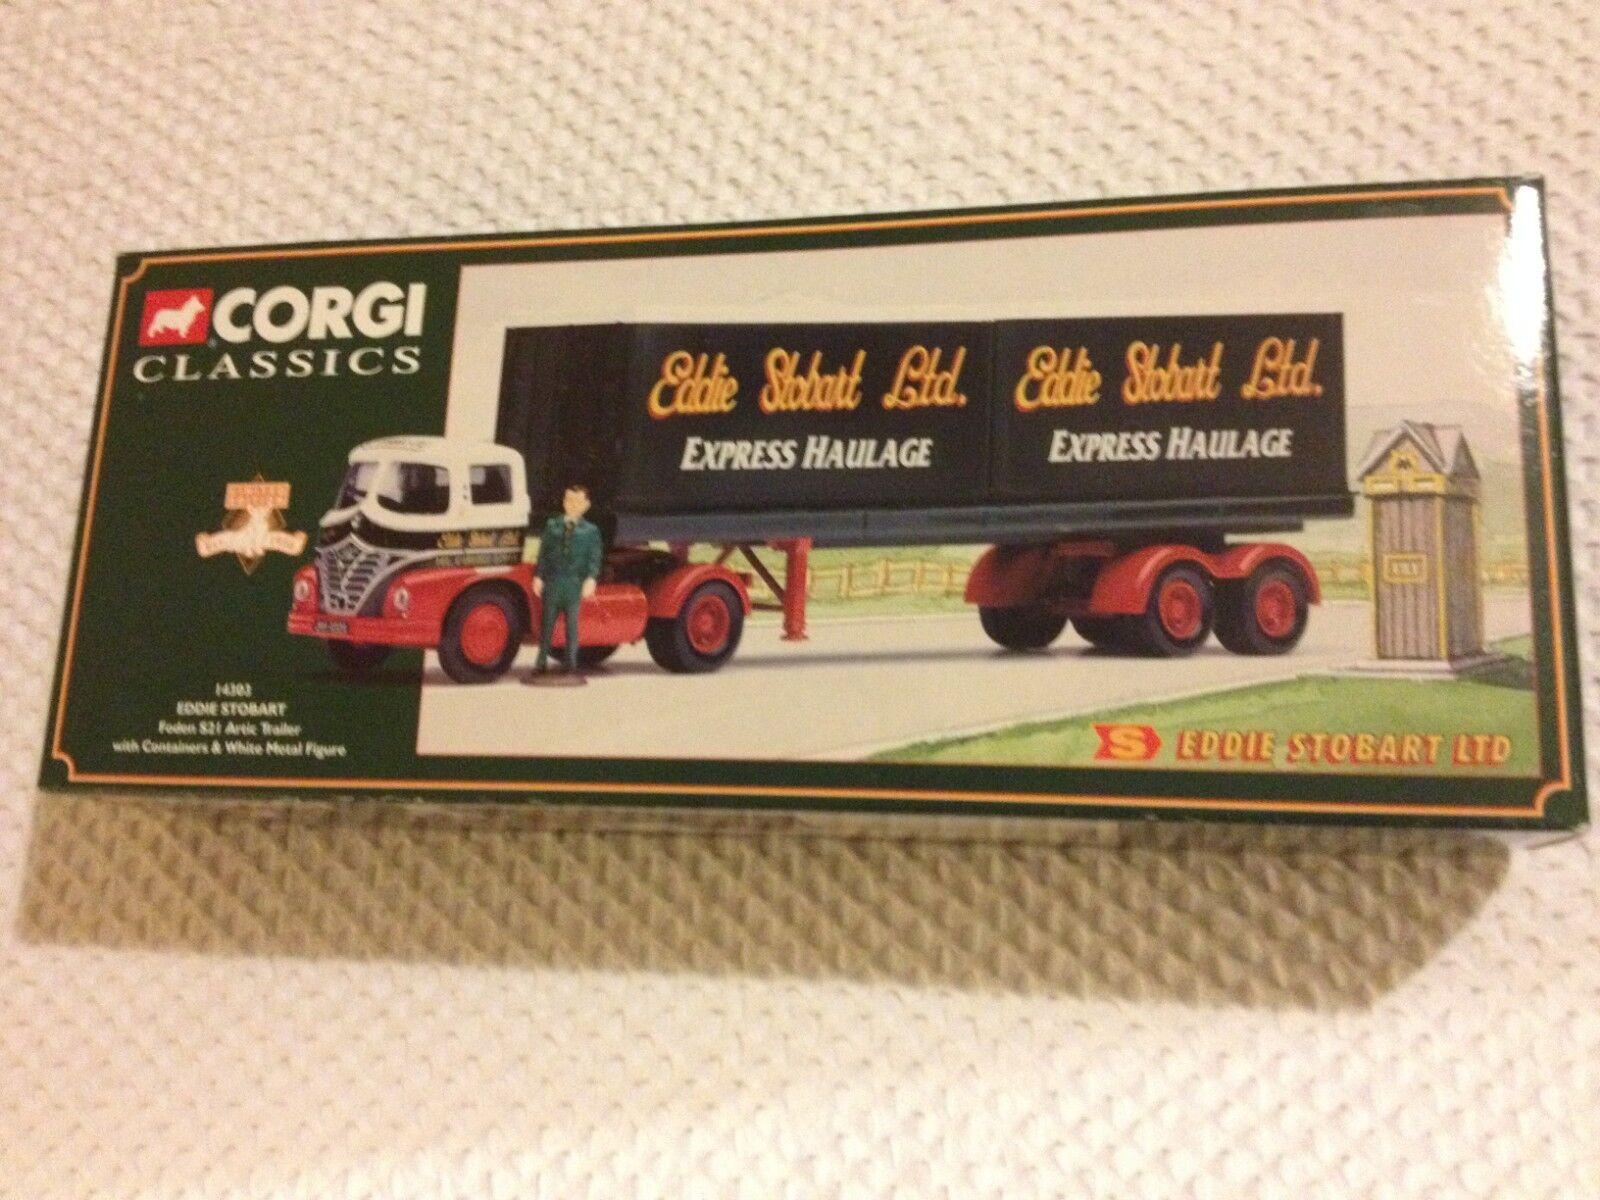 Corgi Classics- Eddie Stobart 14303 - Foden S21 Artic Trailer Containers Figure